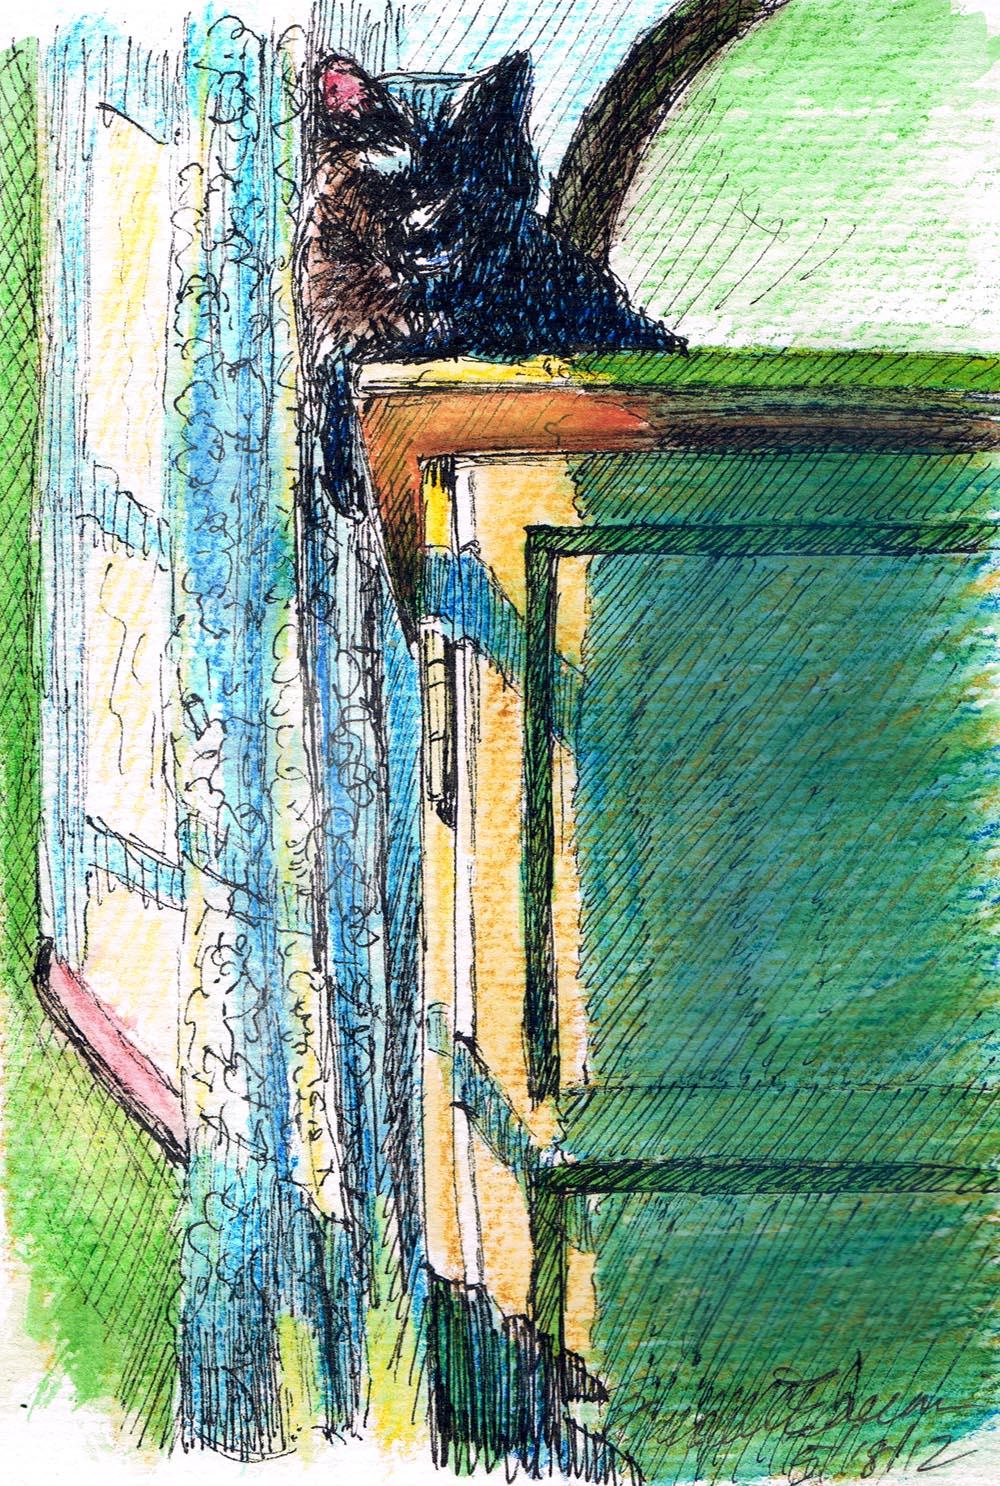 Top of the World, 5 x 7, ink marker and watercolor pencil © B.E. Kazmarski